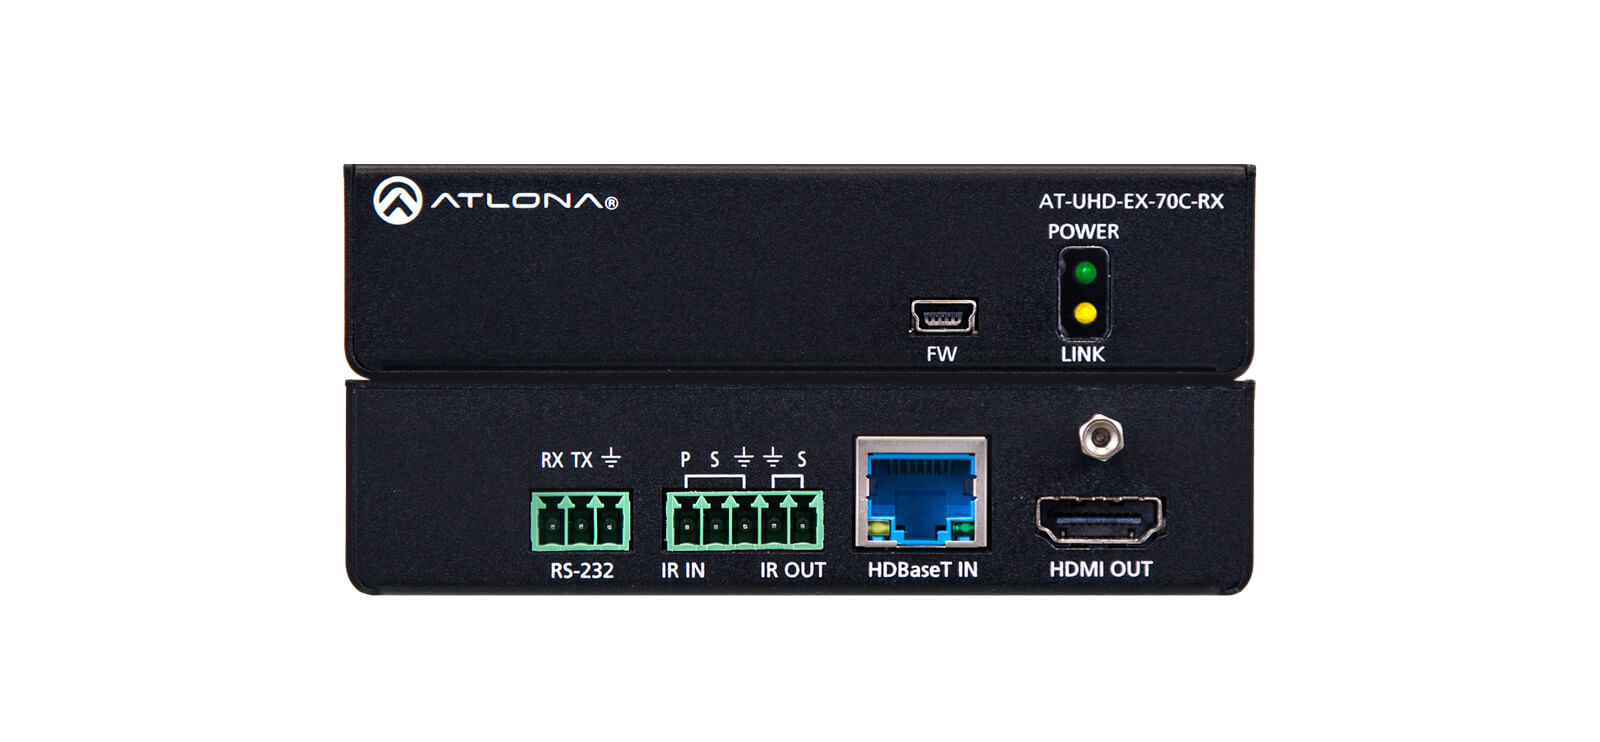 Extensor De Video Con Cable De Red, Hasta 70mts Por Pza.